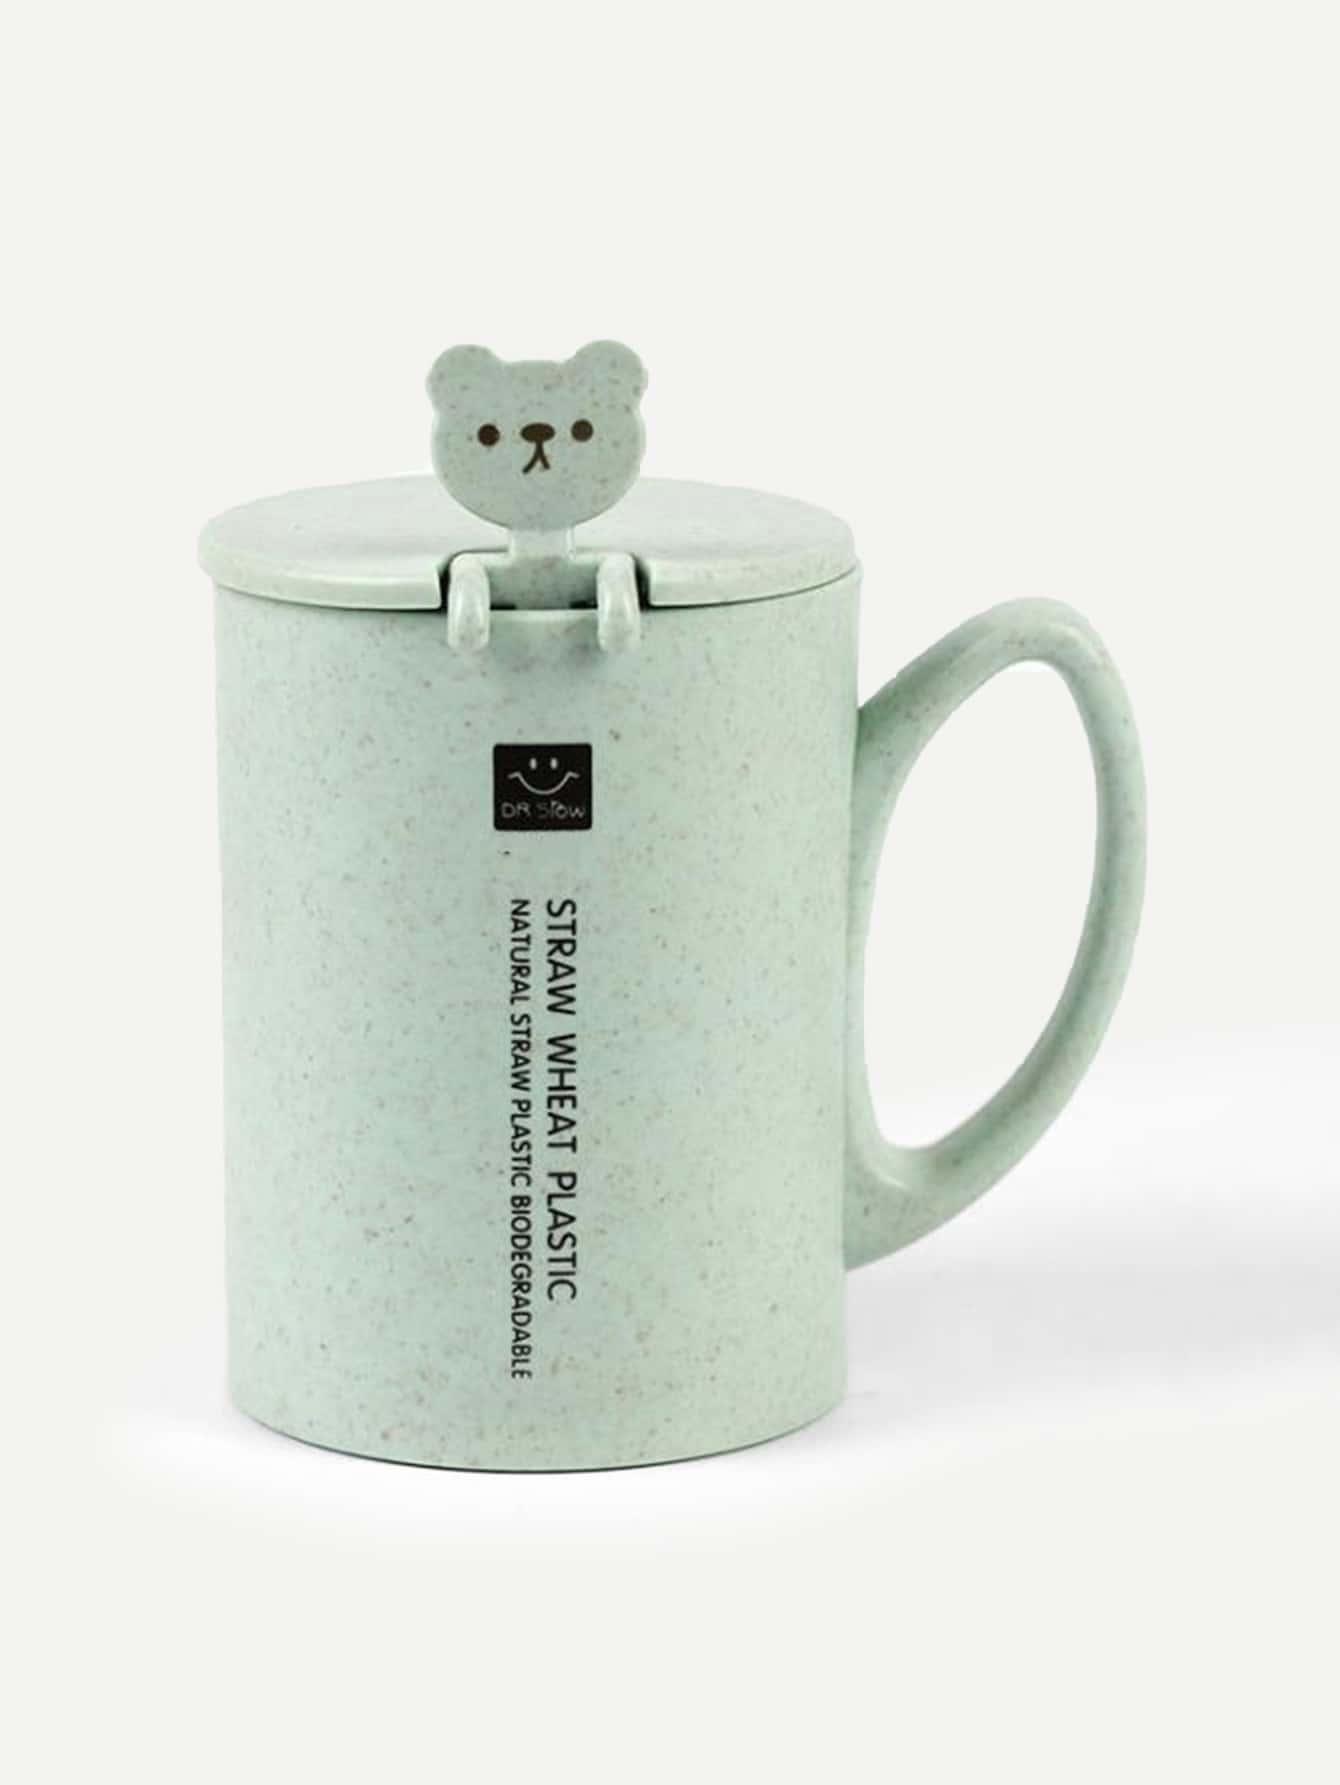 Mug Cup & Lid & Spoon free shipping double station mug press heat press machine mug cup sublimation transfer printing